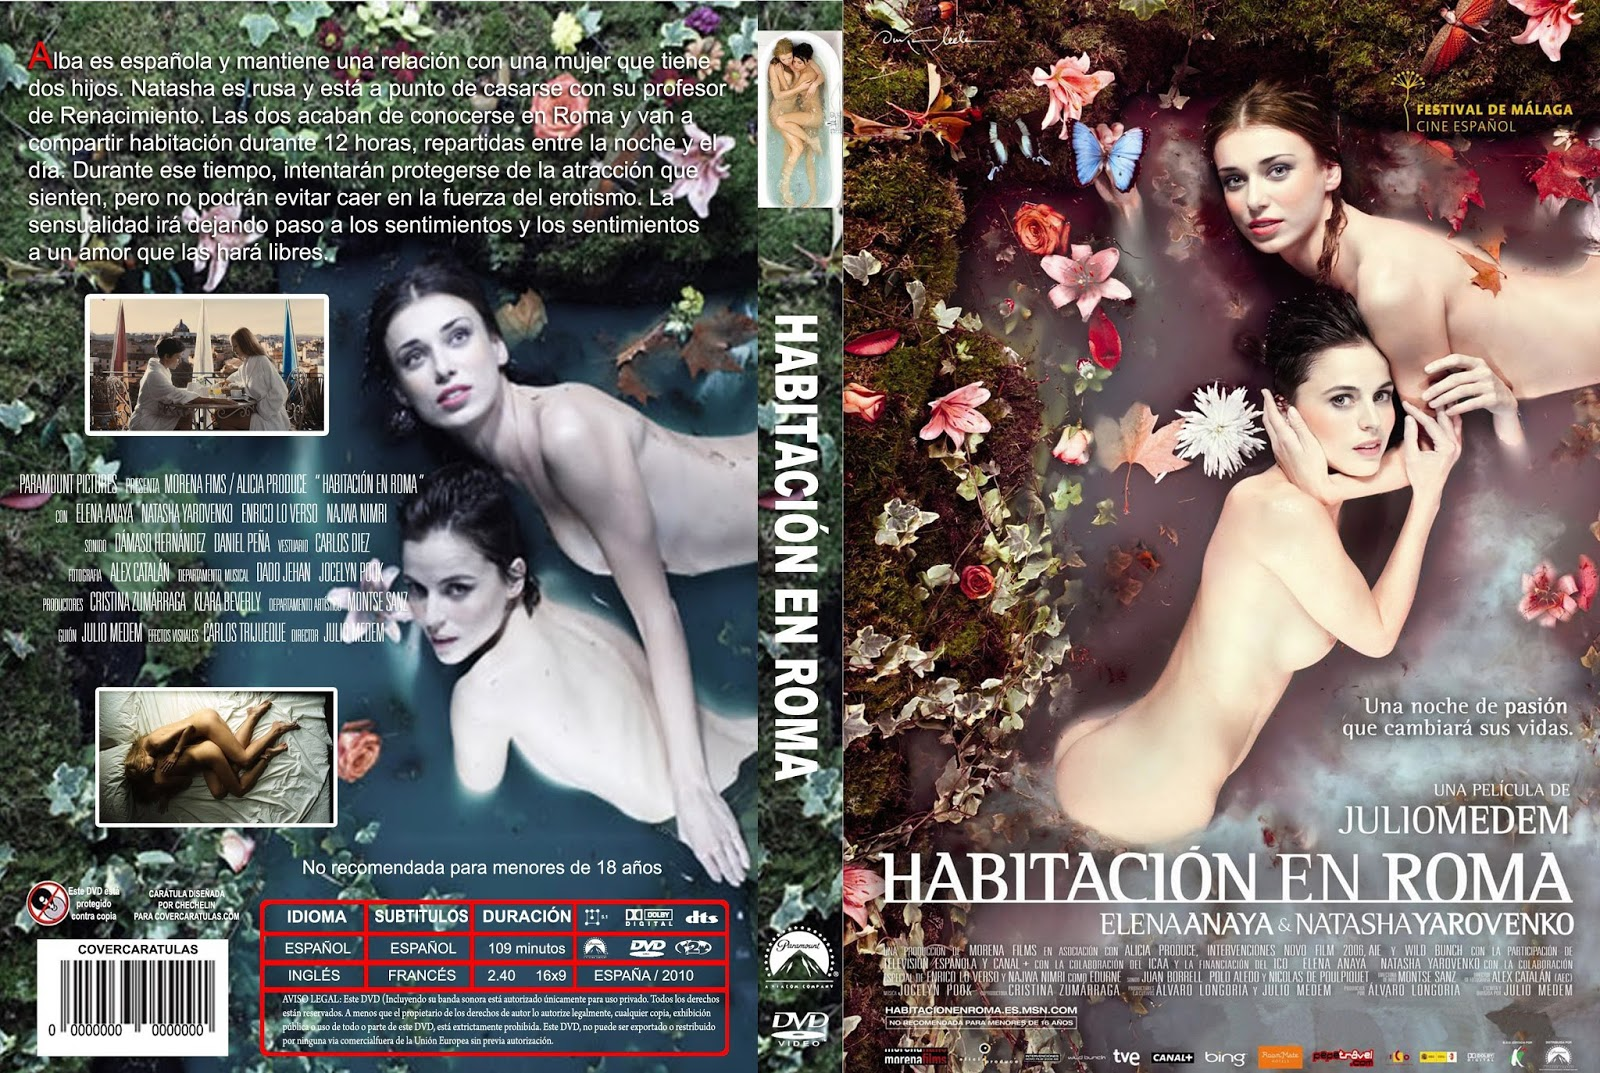 DVD  PS2  SERIES  PROGRAMAS Habitacin En Roma Drama